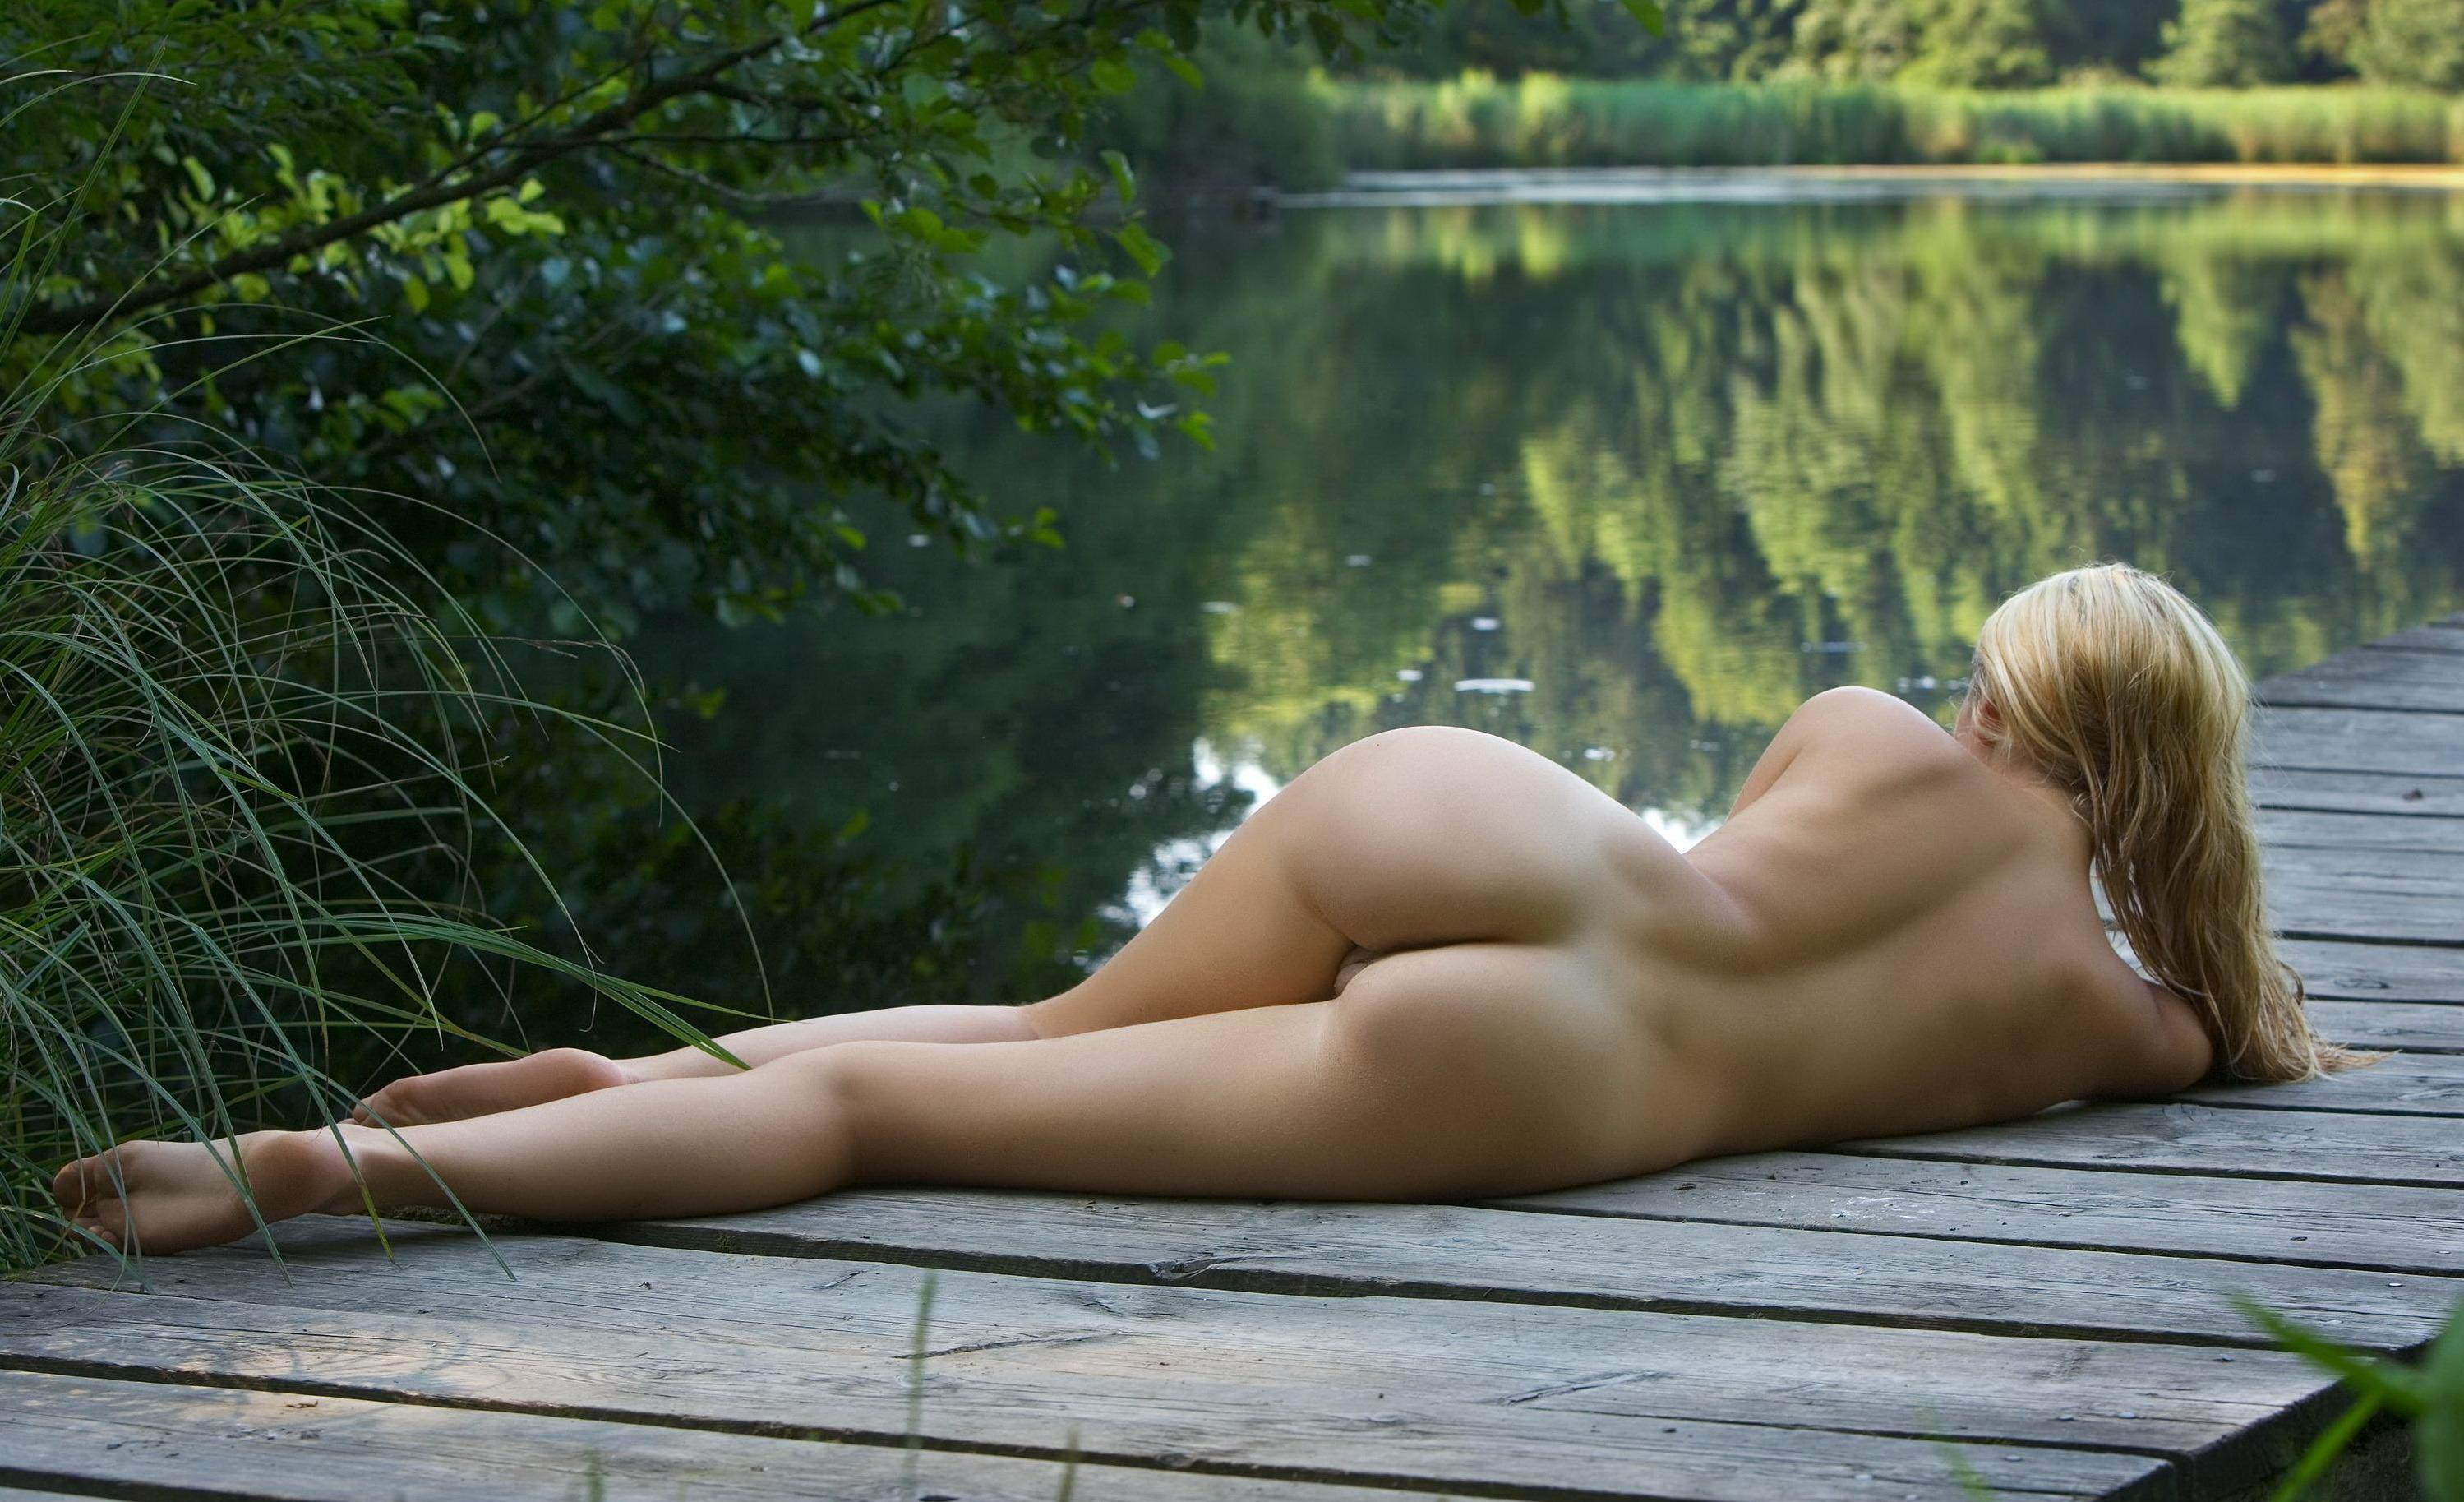 Nude woman foto hentia pic